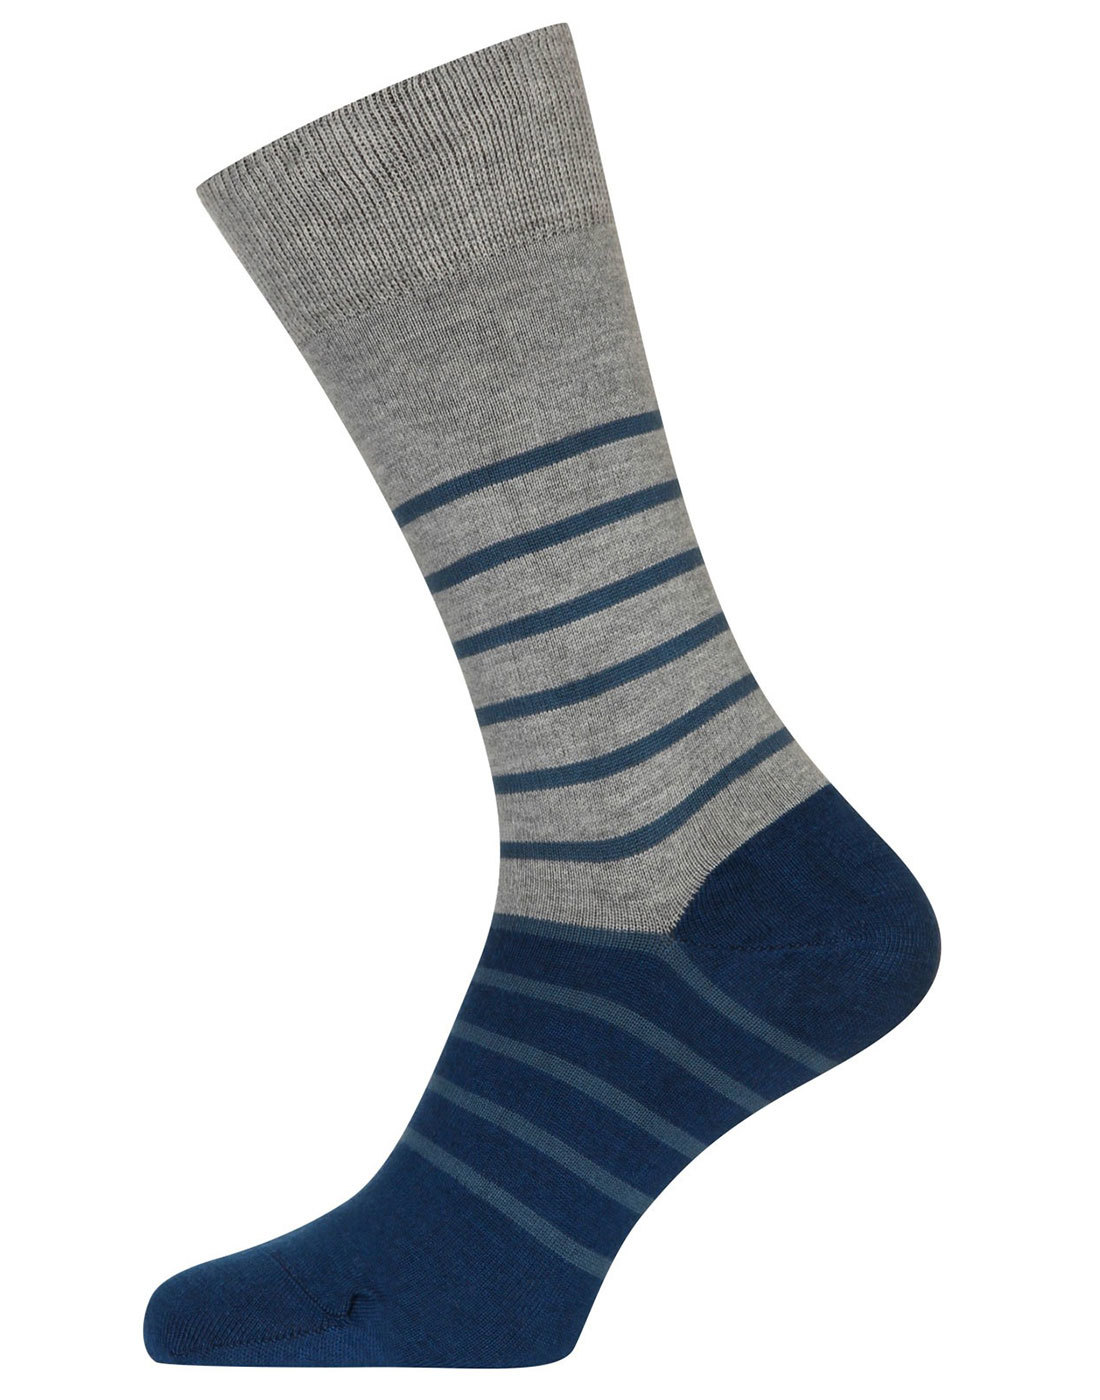 Dionysus JOHN SMEDELY Colour Block Stripe Socks I